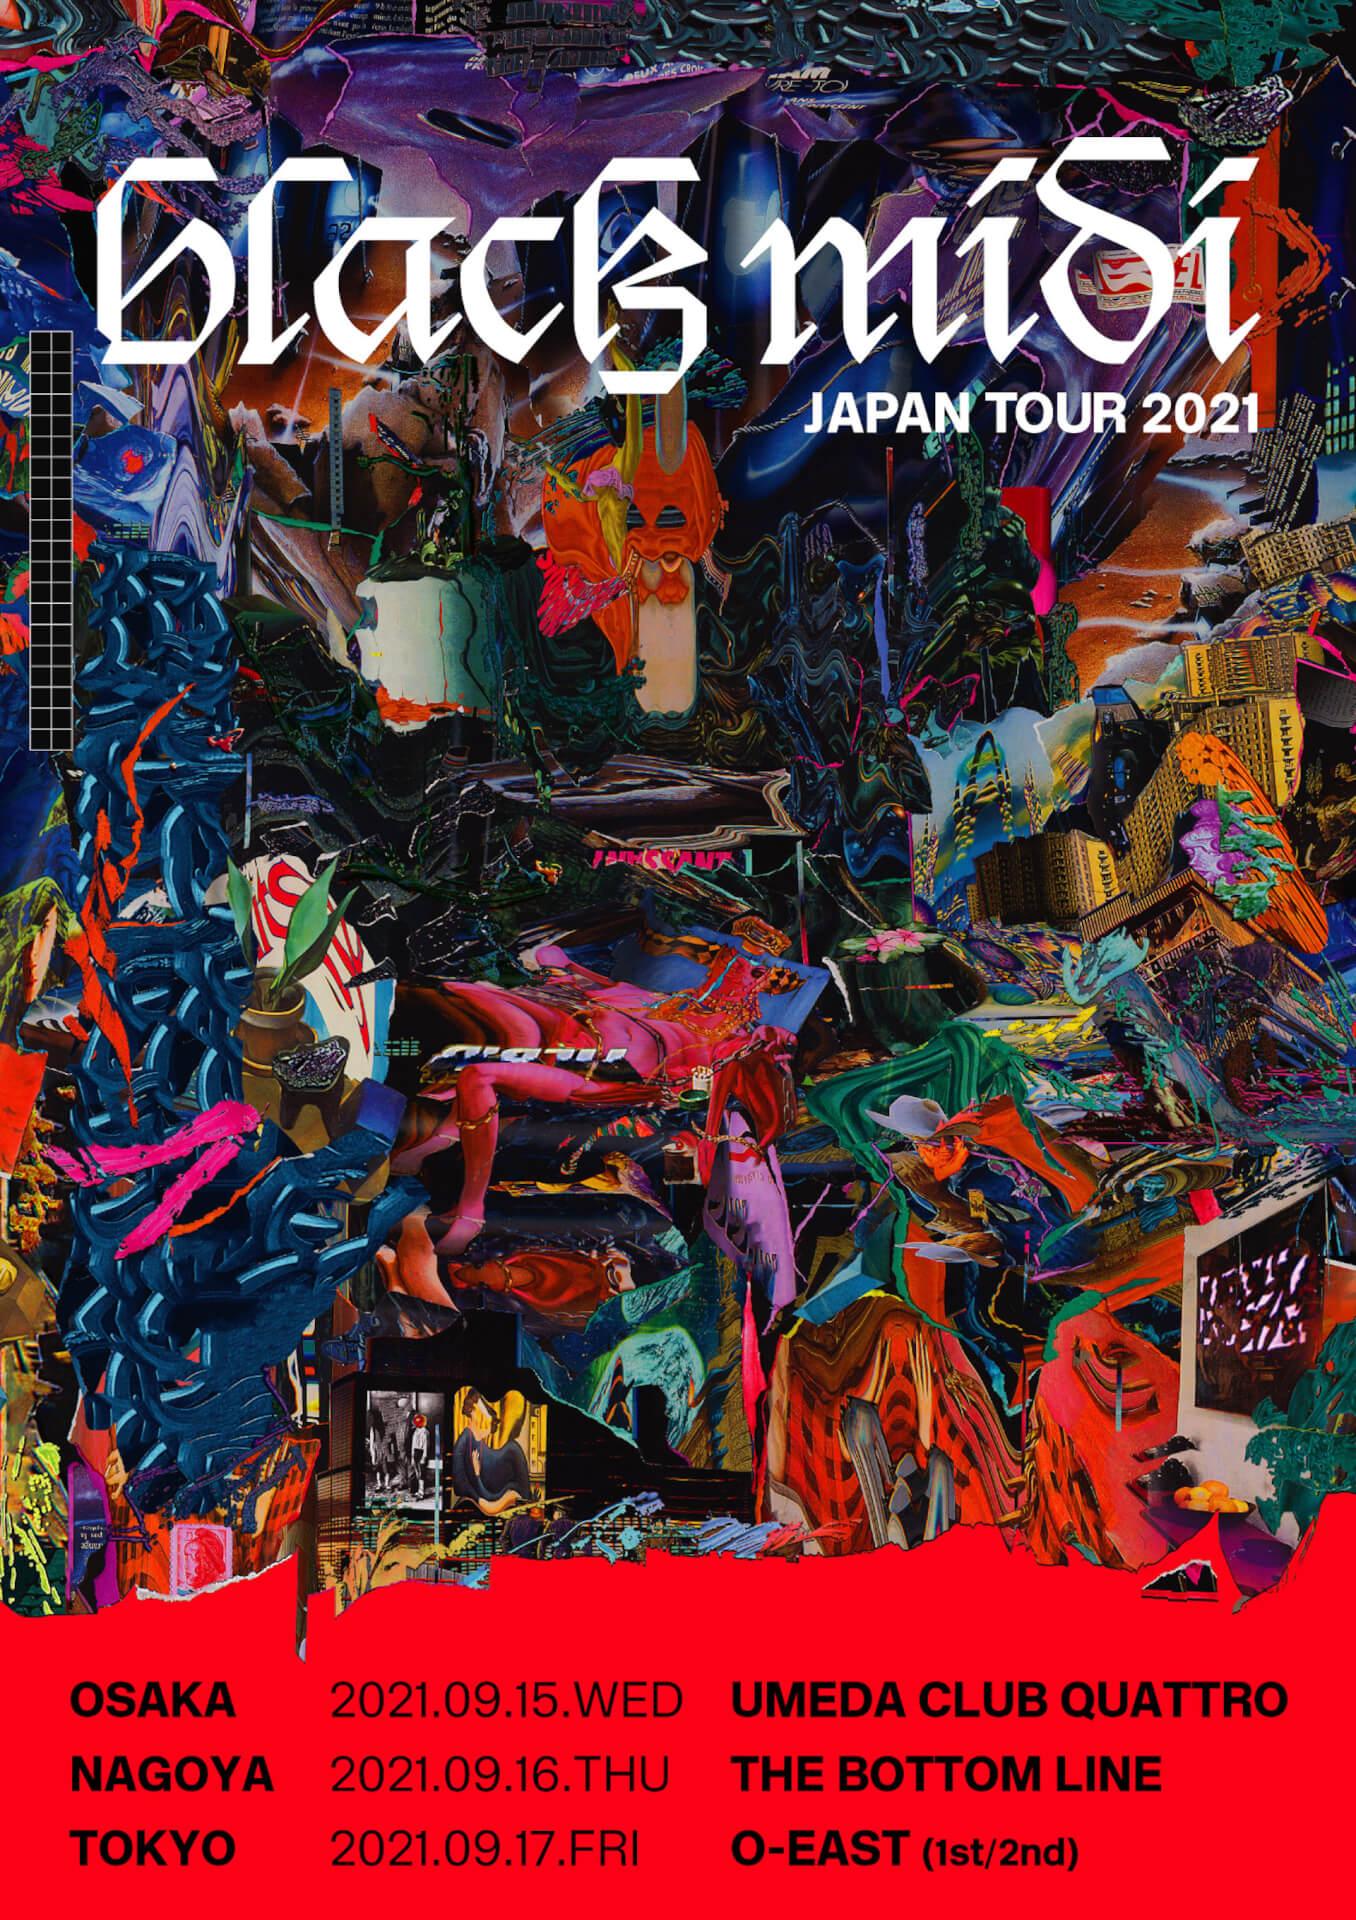 2ndアルバム『Cavalcade』をリリースしたblack midiによるジャパンツアーが開催決定!東京・大阪・名古屋を周遊 music210610_blackmidi_tour_1